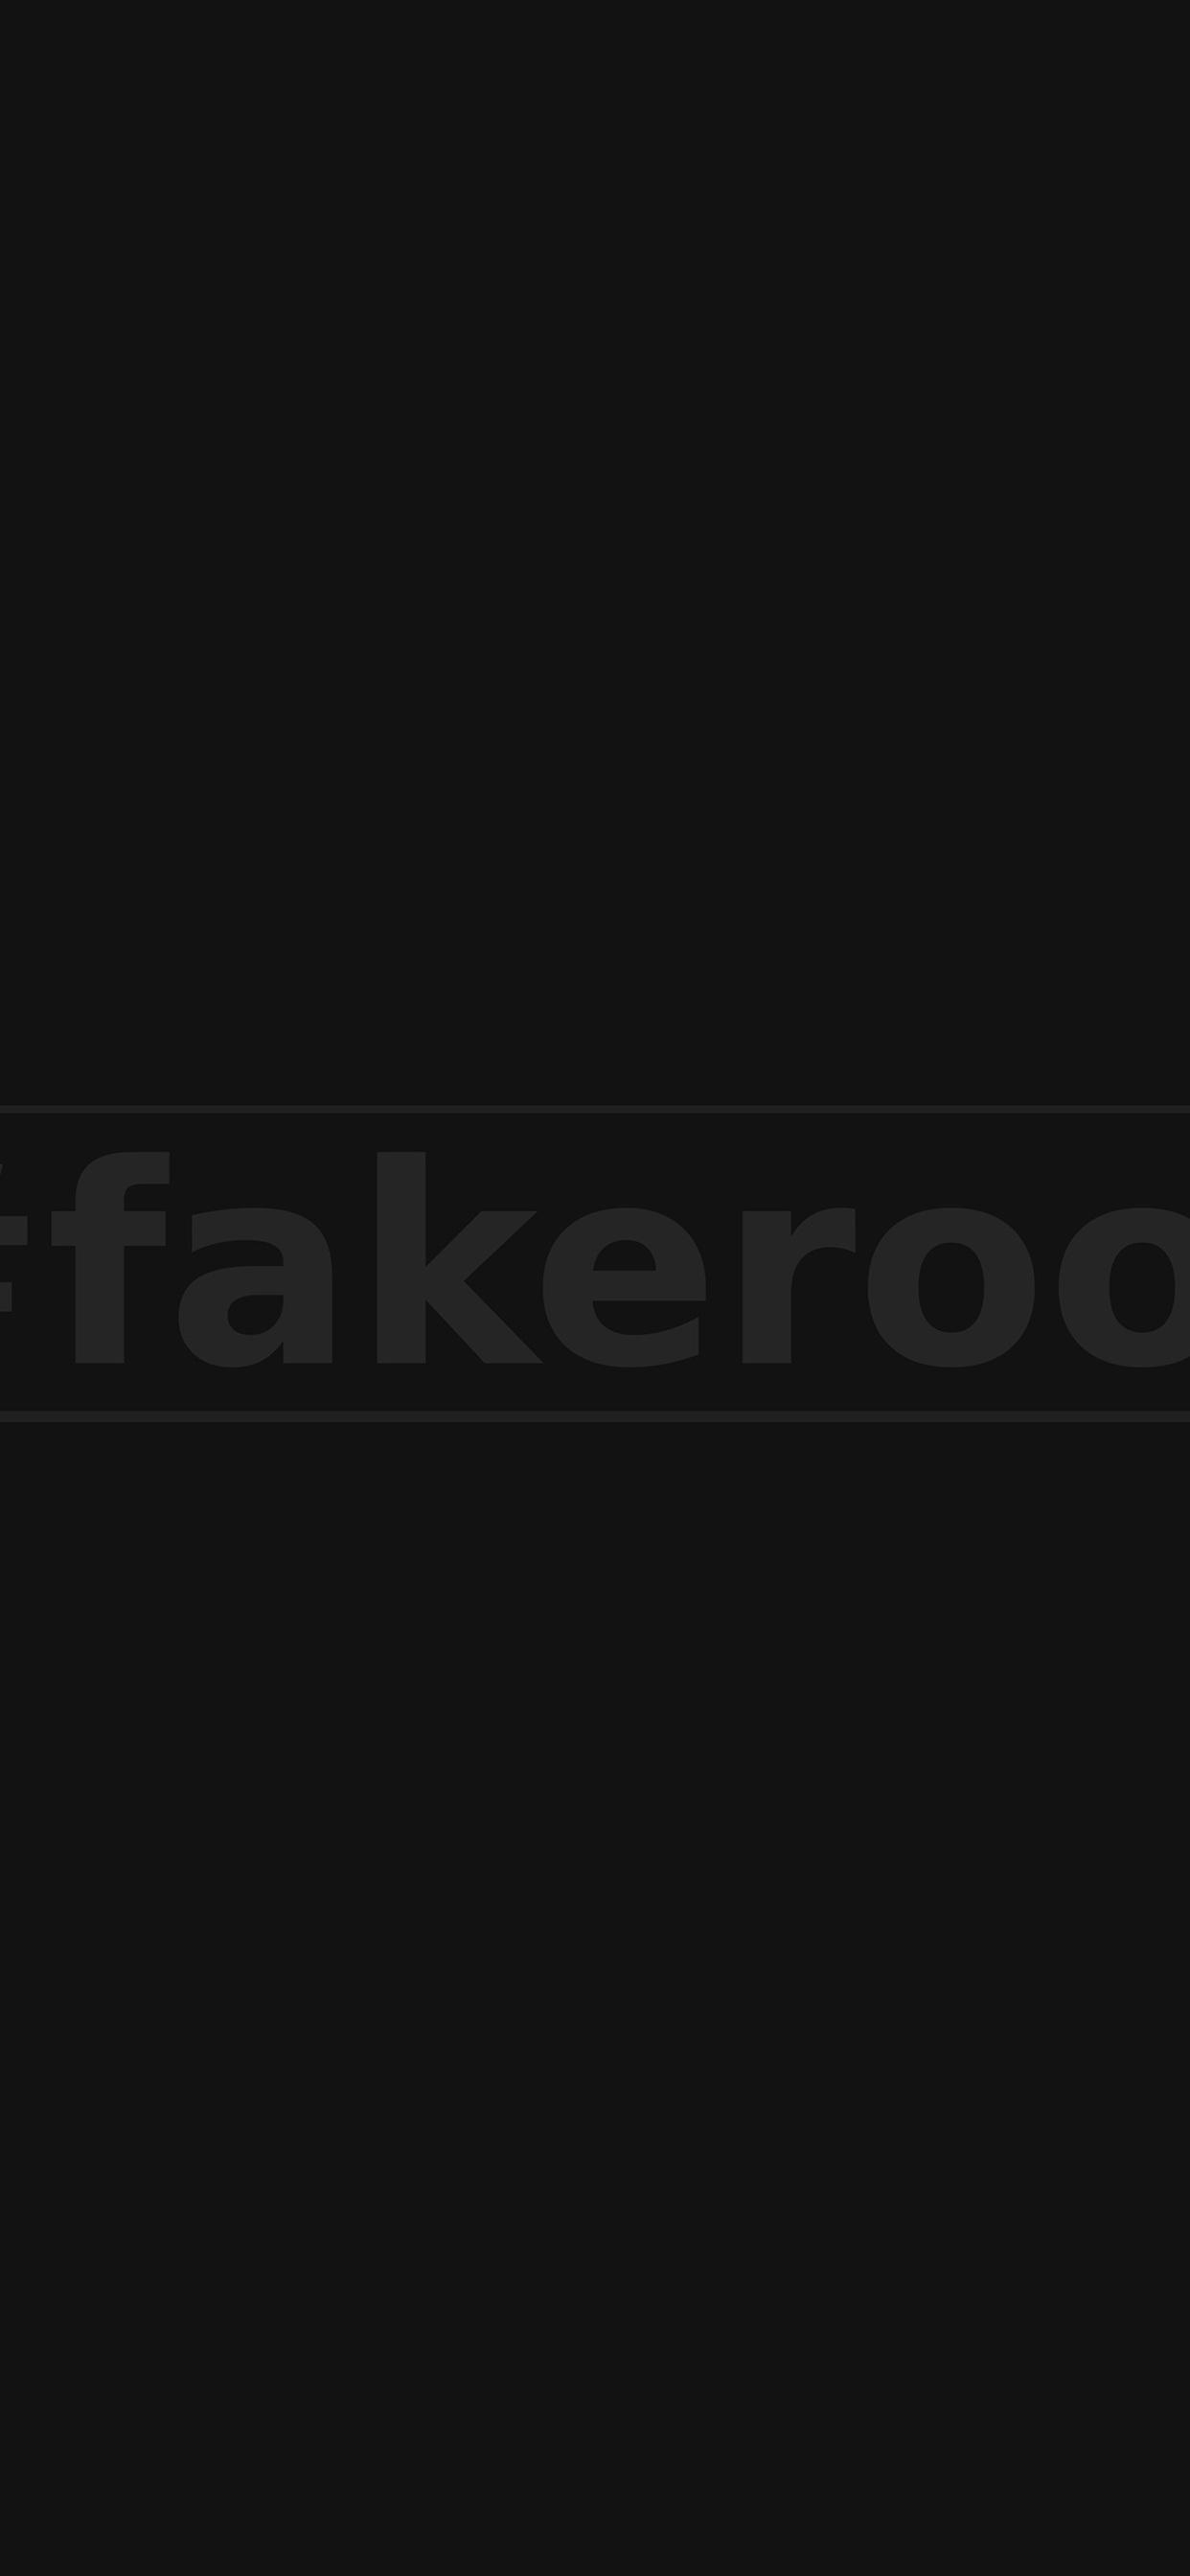 fakeroot-typography-4k-lq.jpg